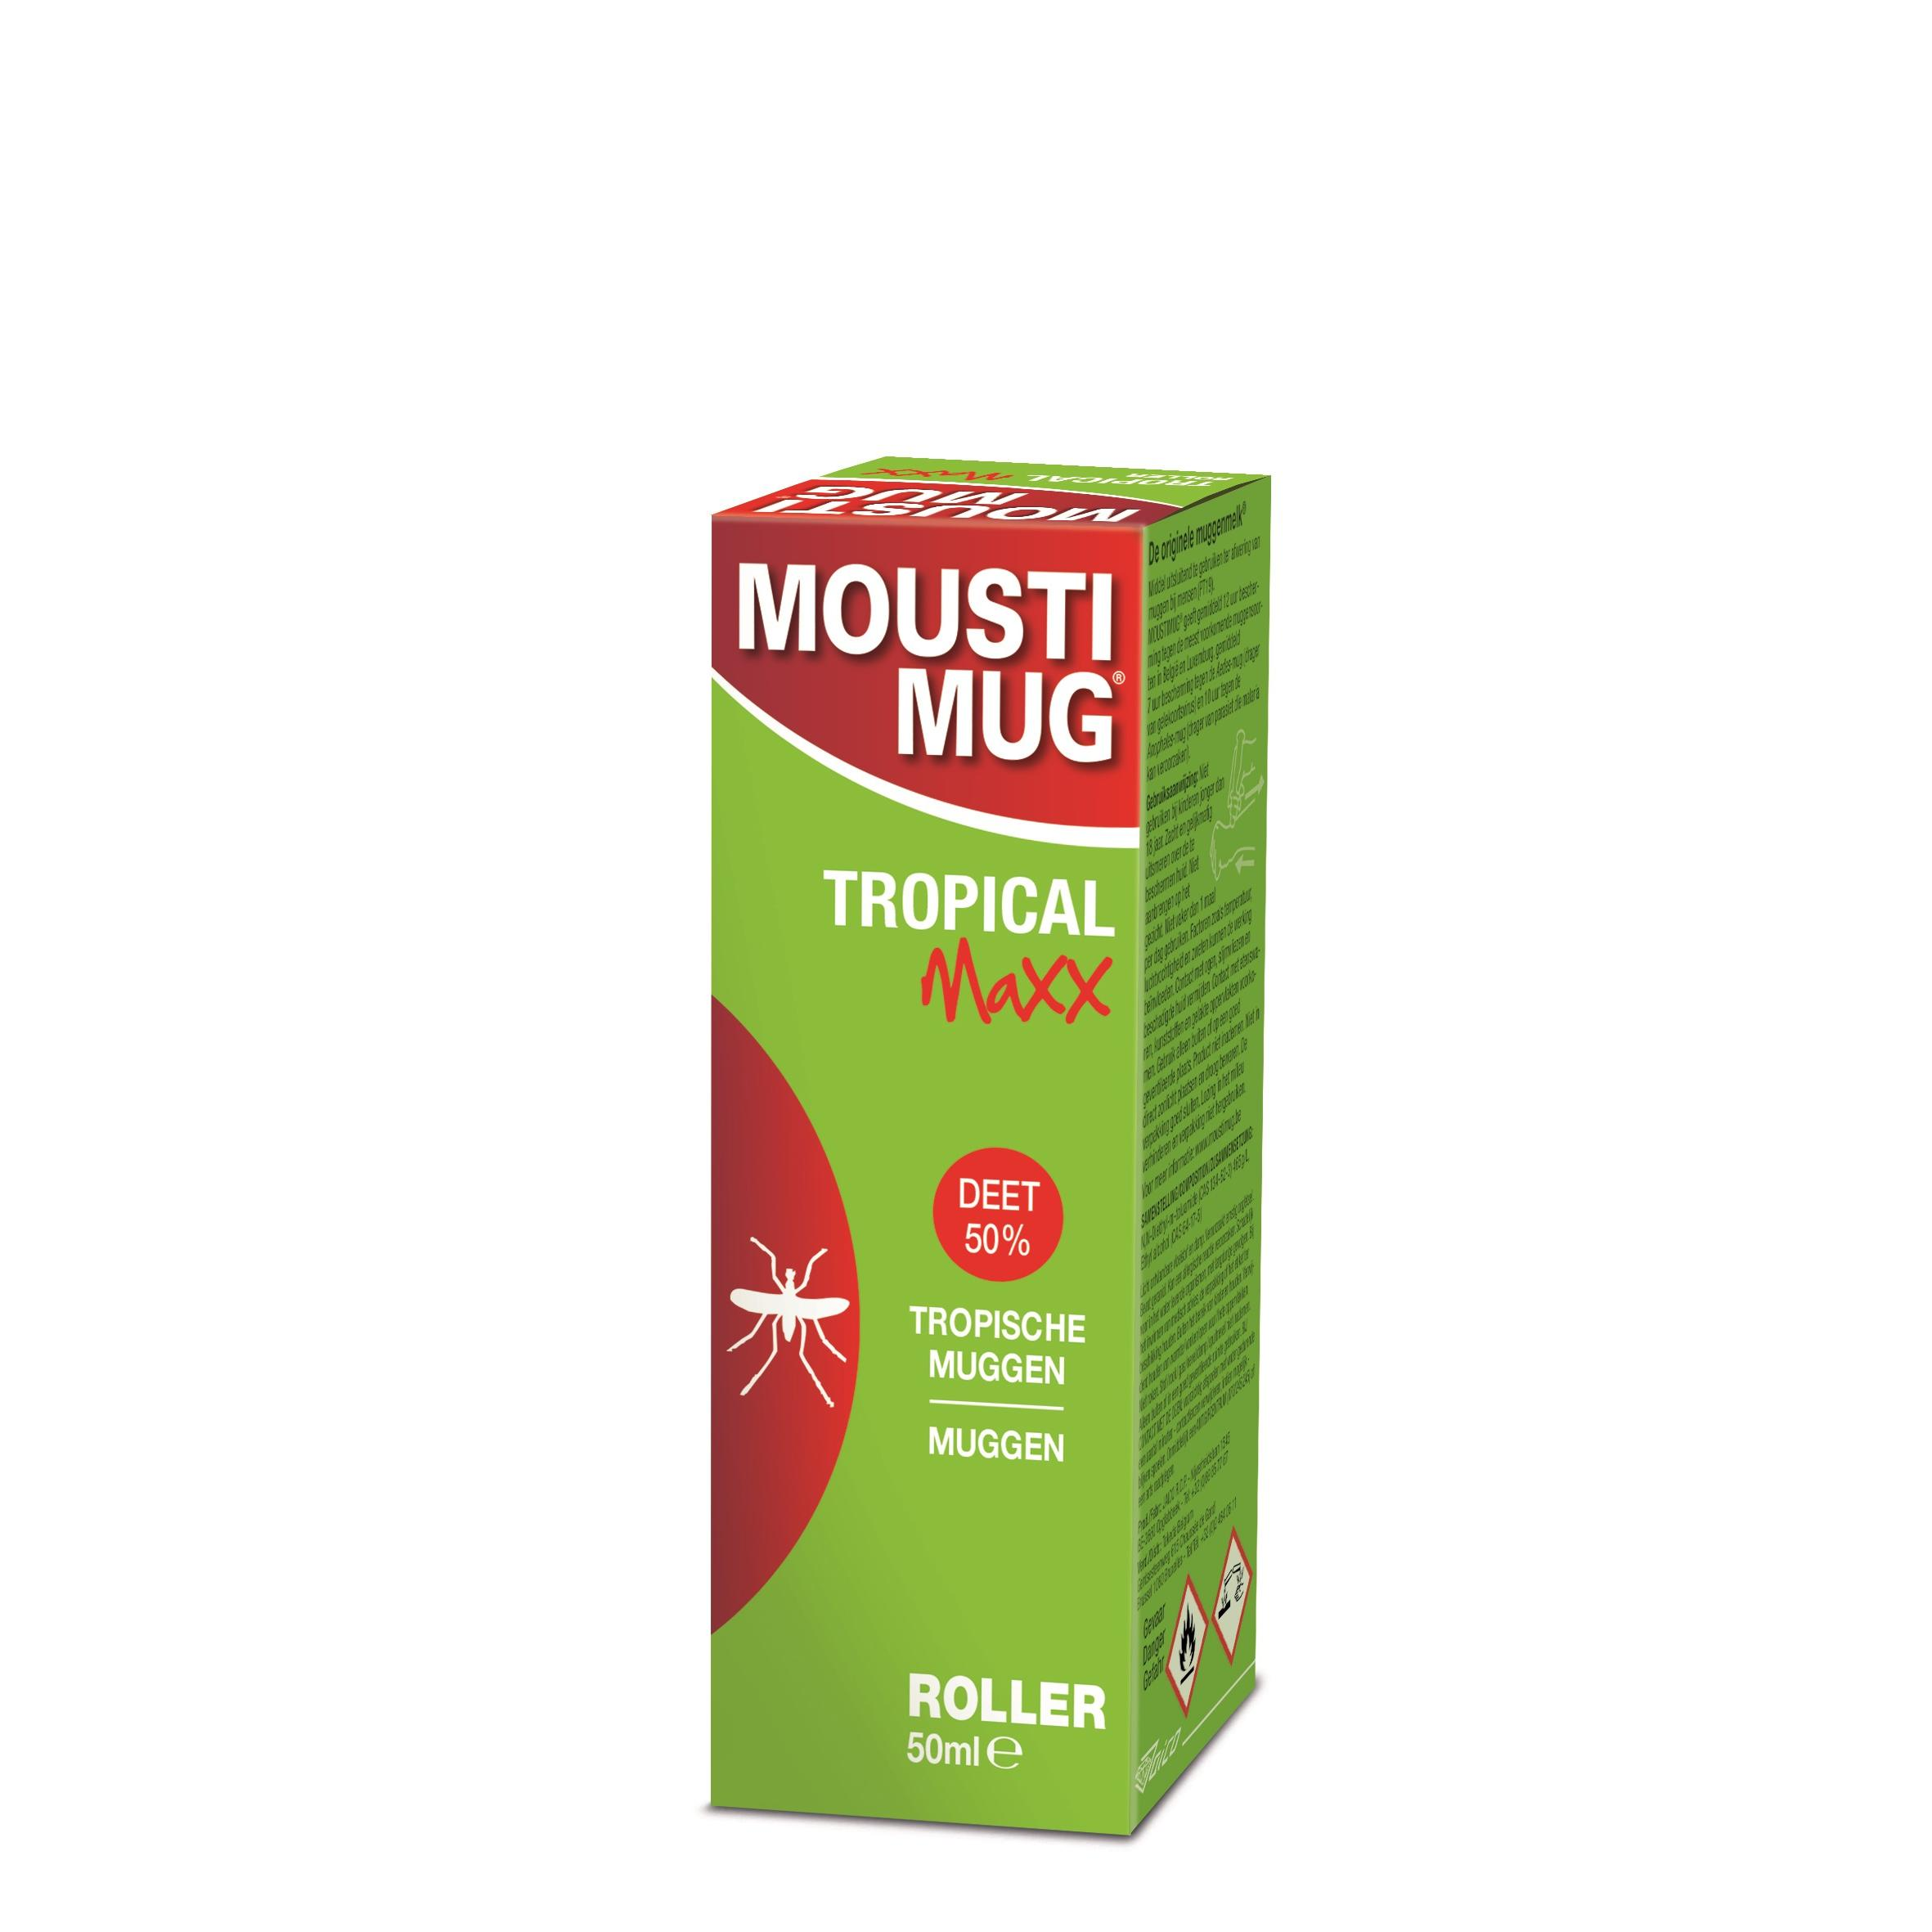 Image of Moustimug tropical maxx